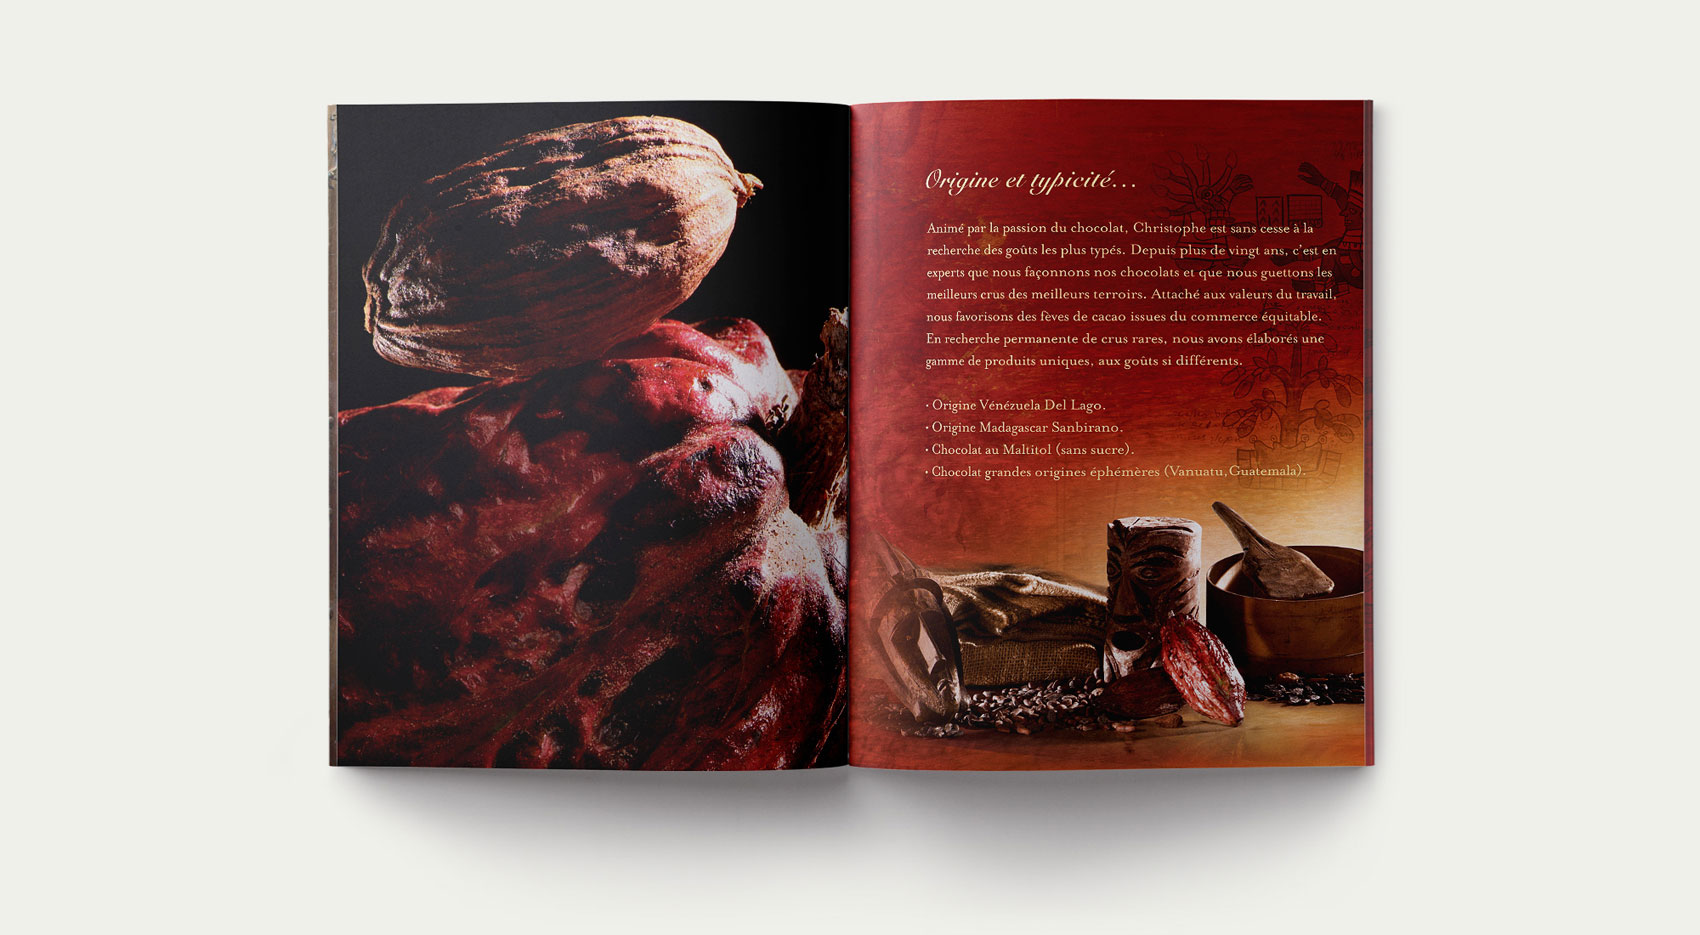 brochure-christian-8